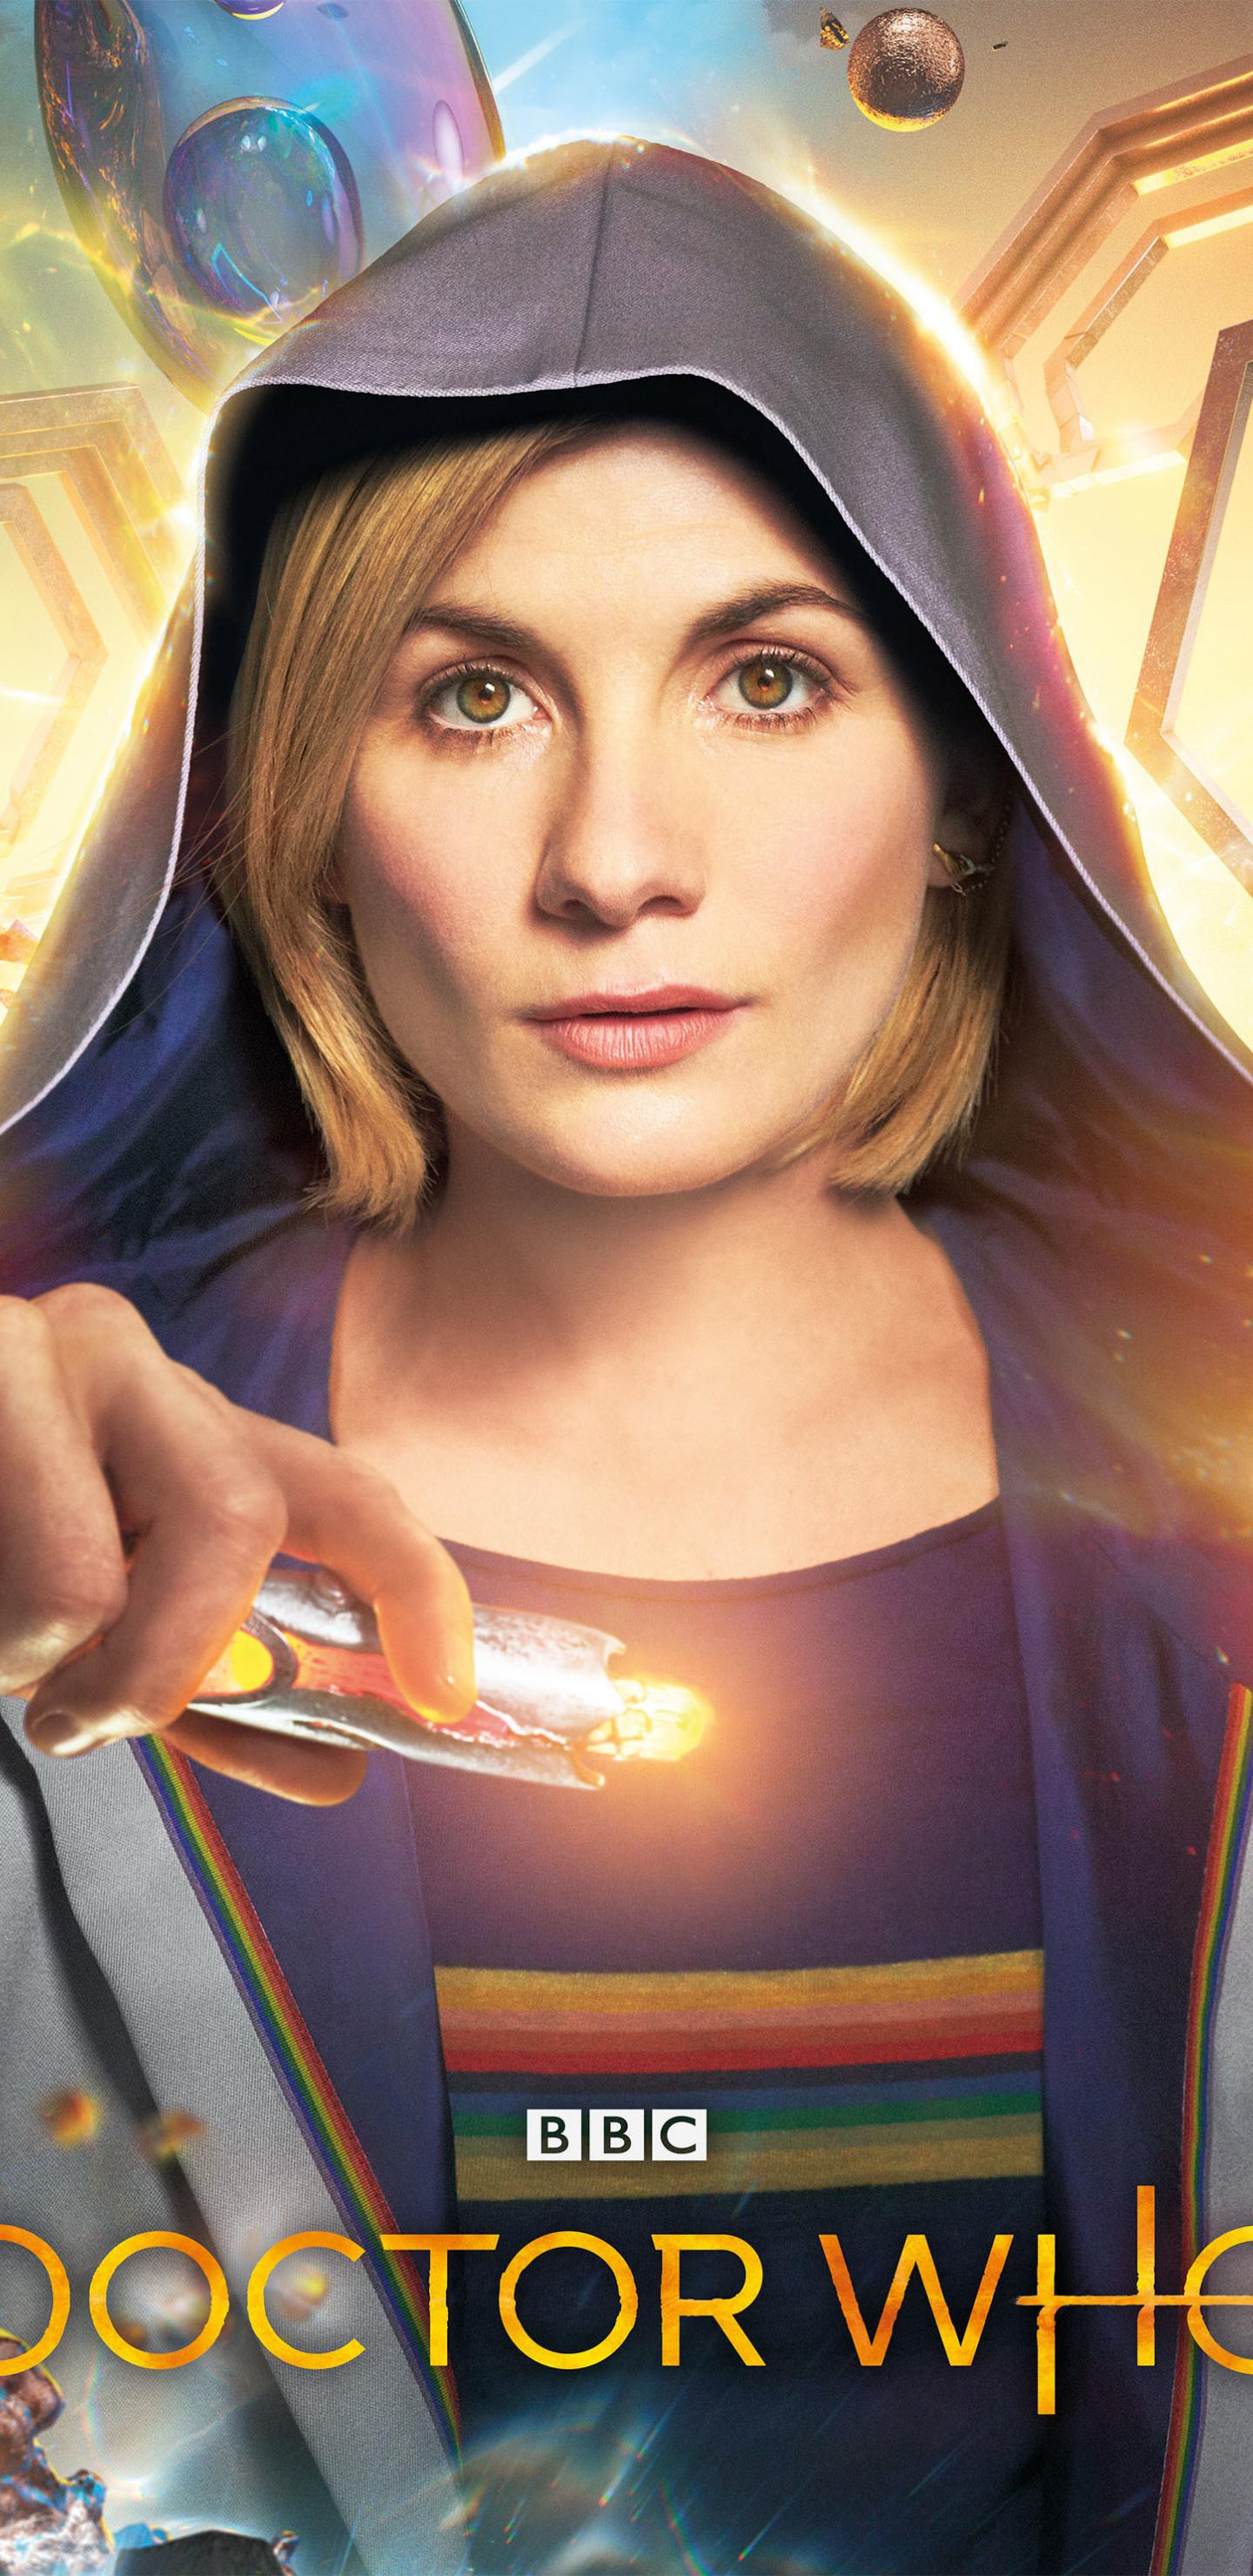 Download 1440x2960 Wallpaper Doctor Who Season 11 Tv Show